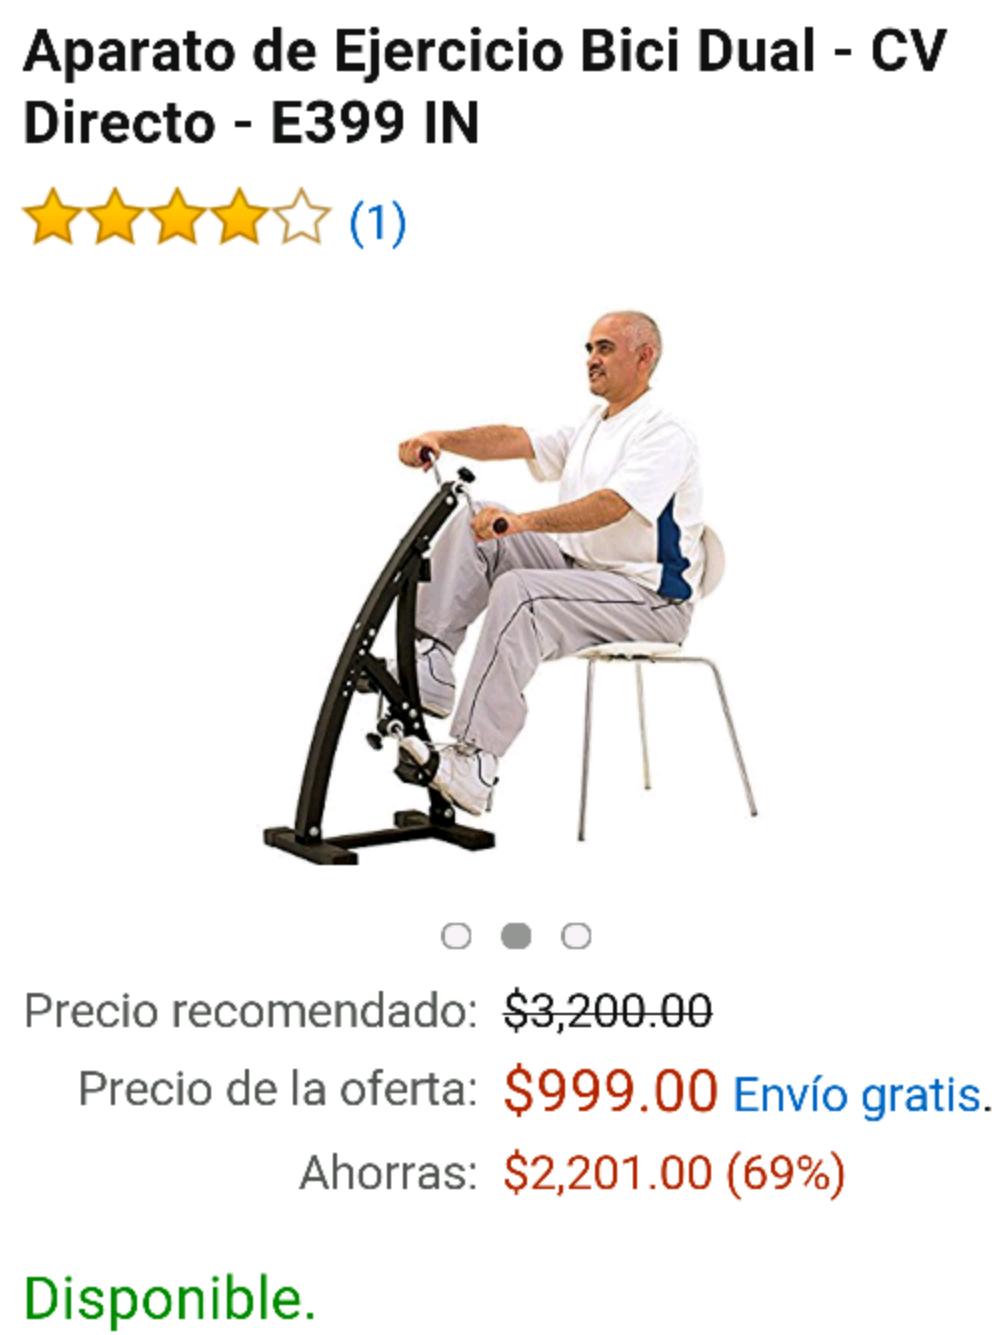 Amazon: Aparato de Ejercicio Bici Dual - CV Directo - E399 IN